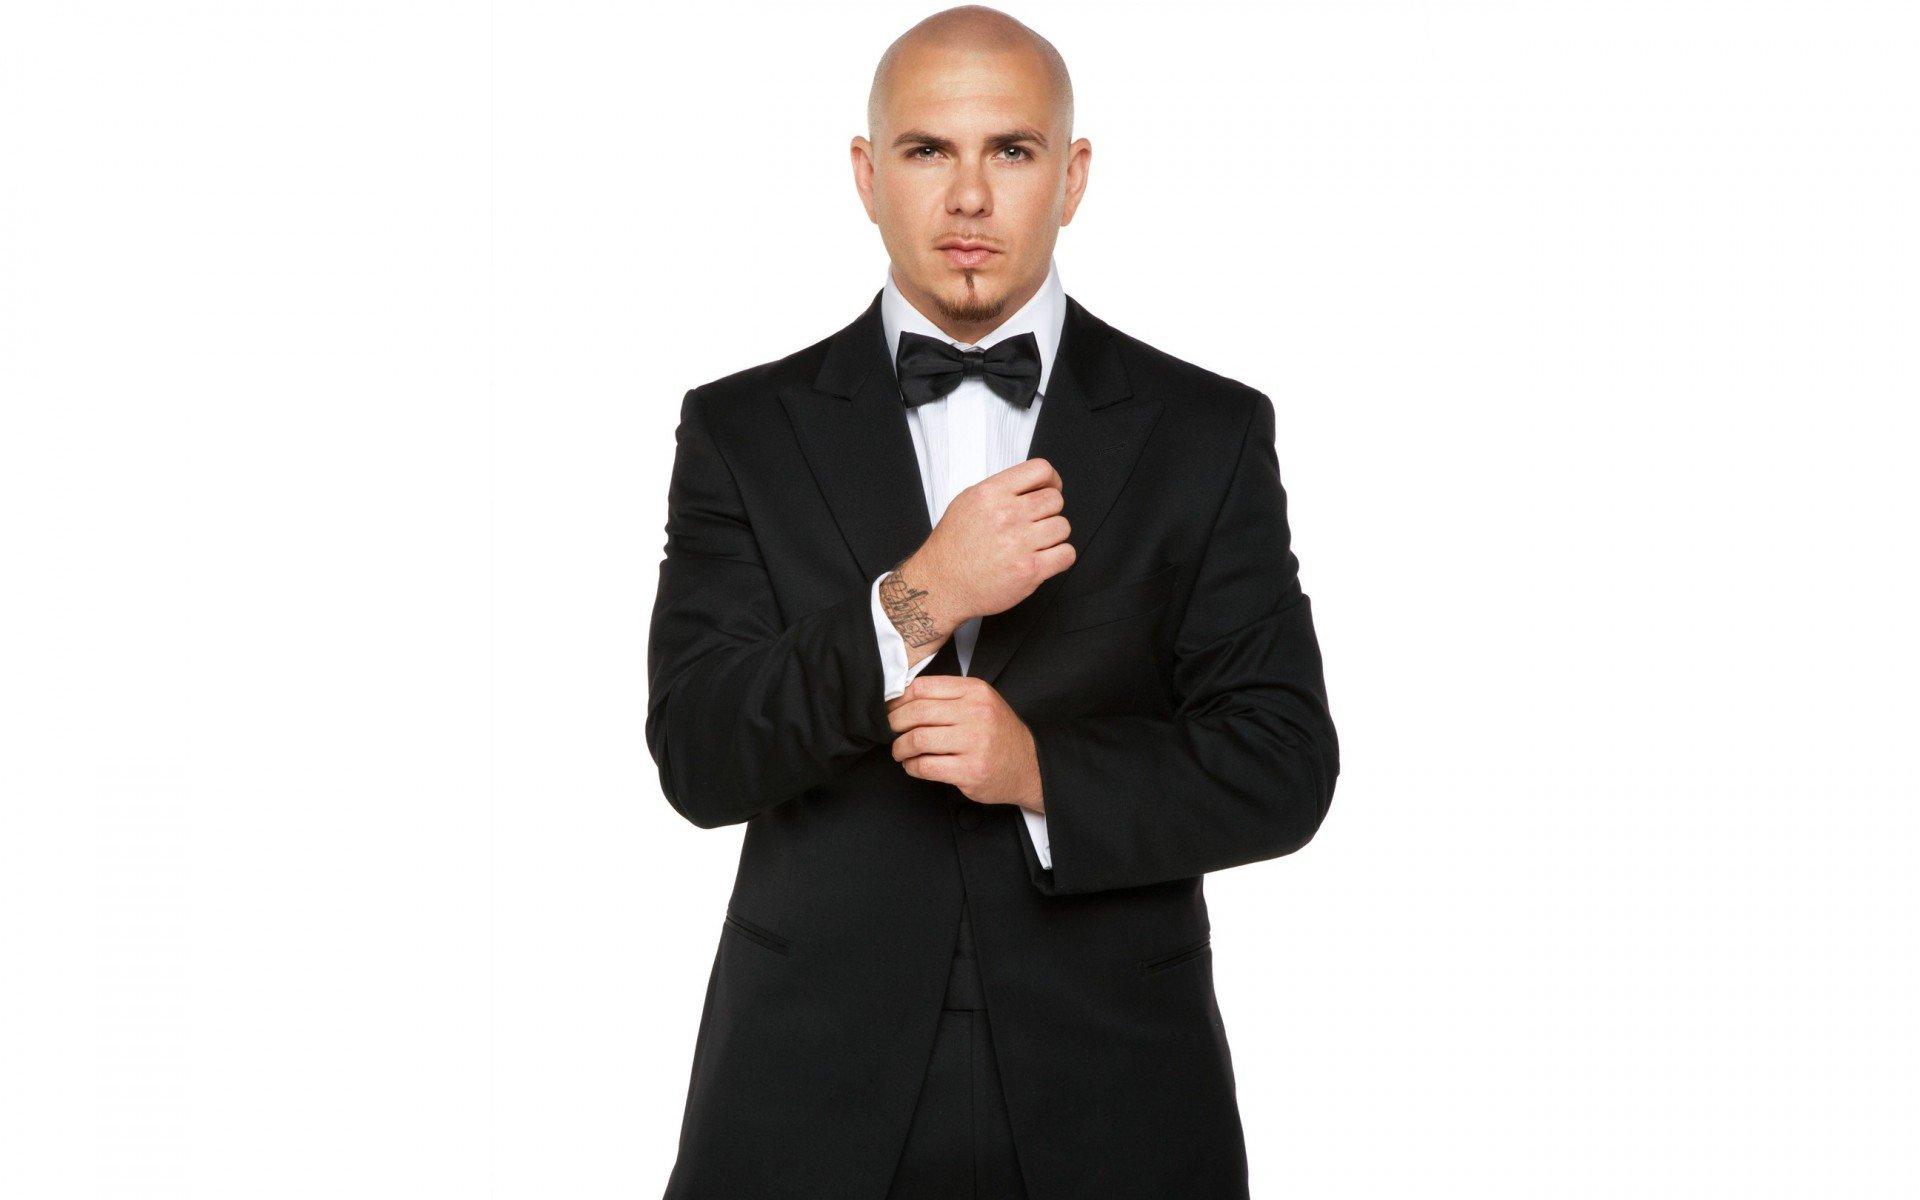 Pin Pitbull-rapper-wallpaper on Pinterest